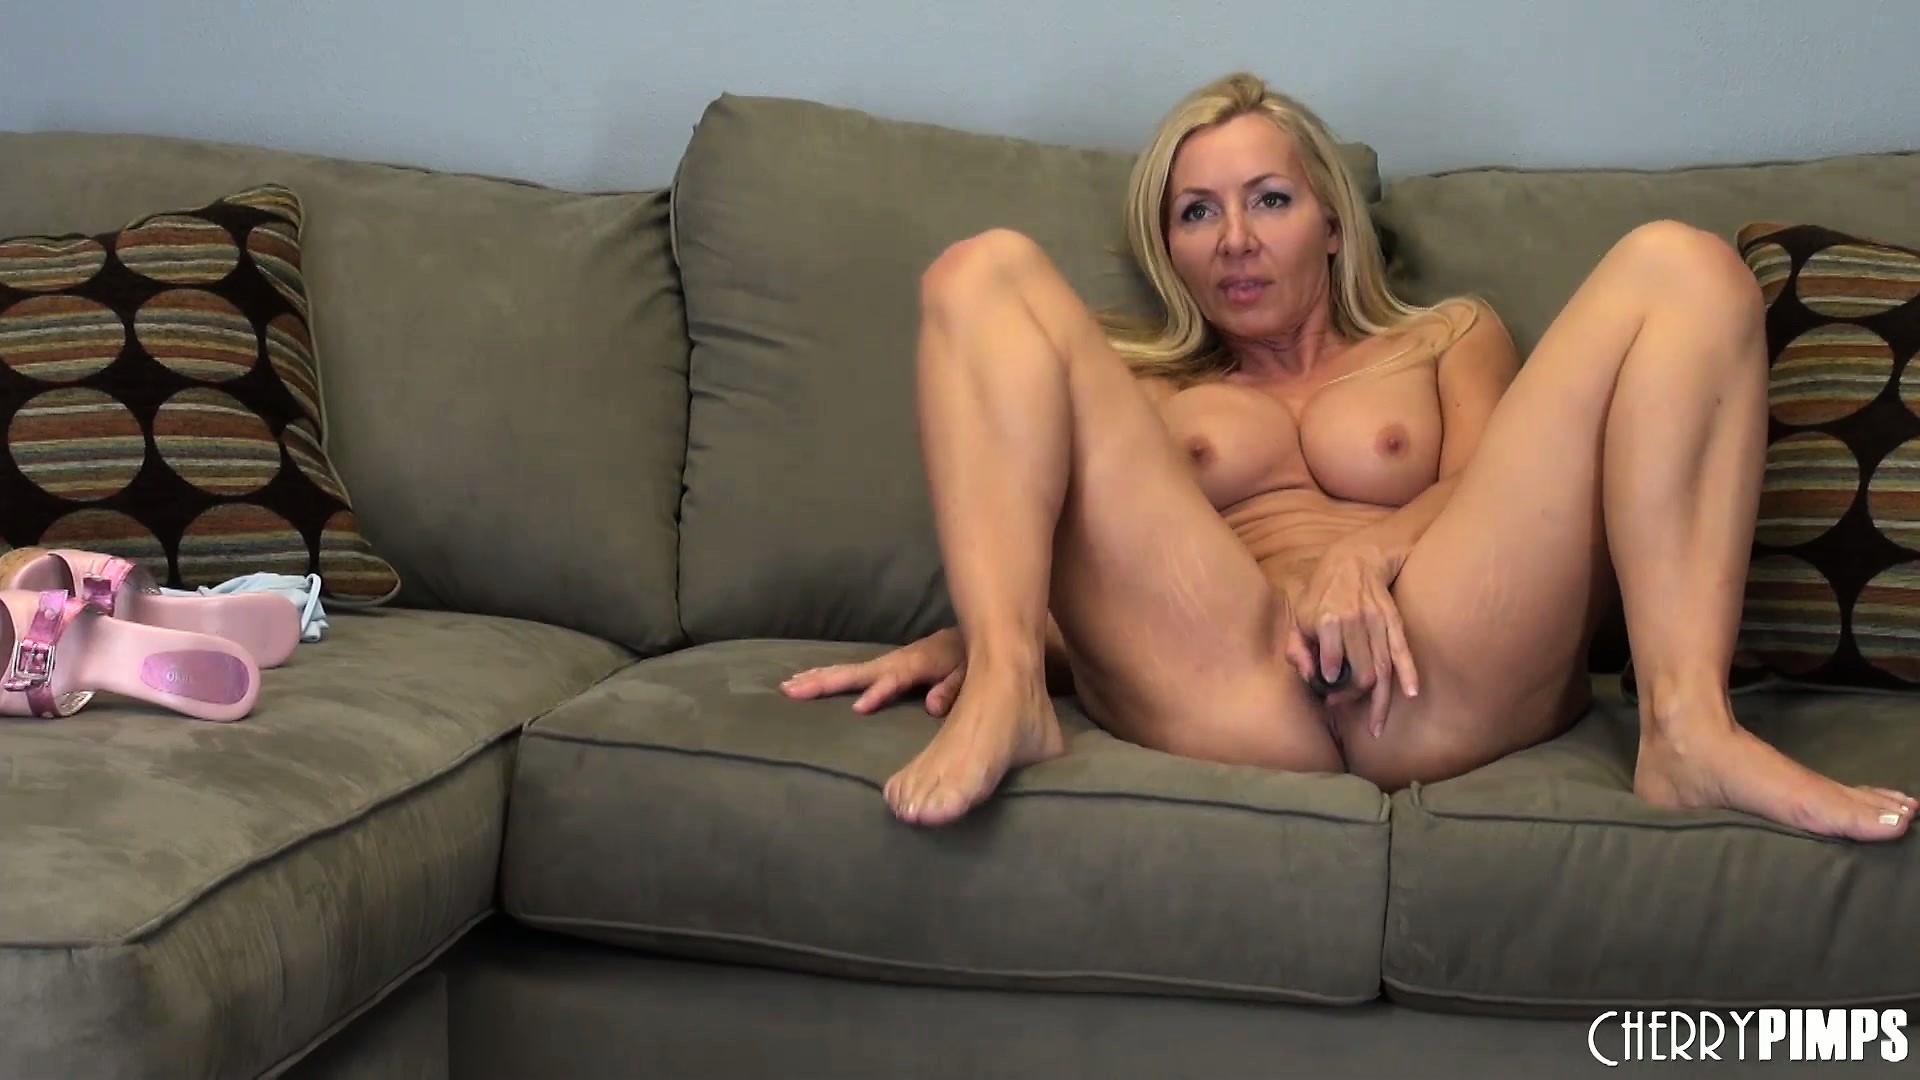 Free full length toys porn videos